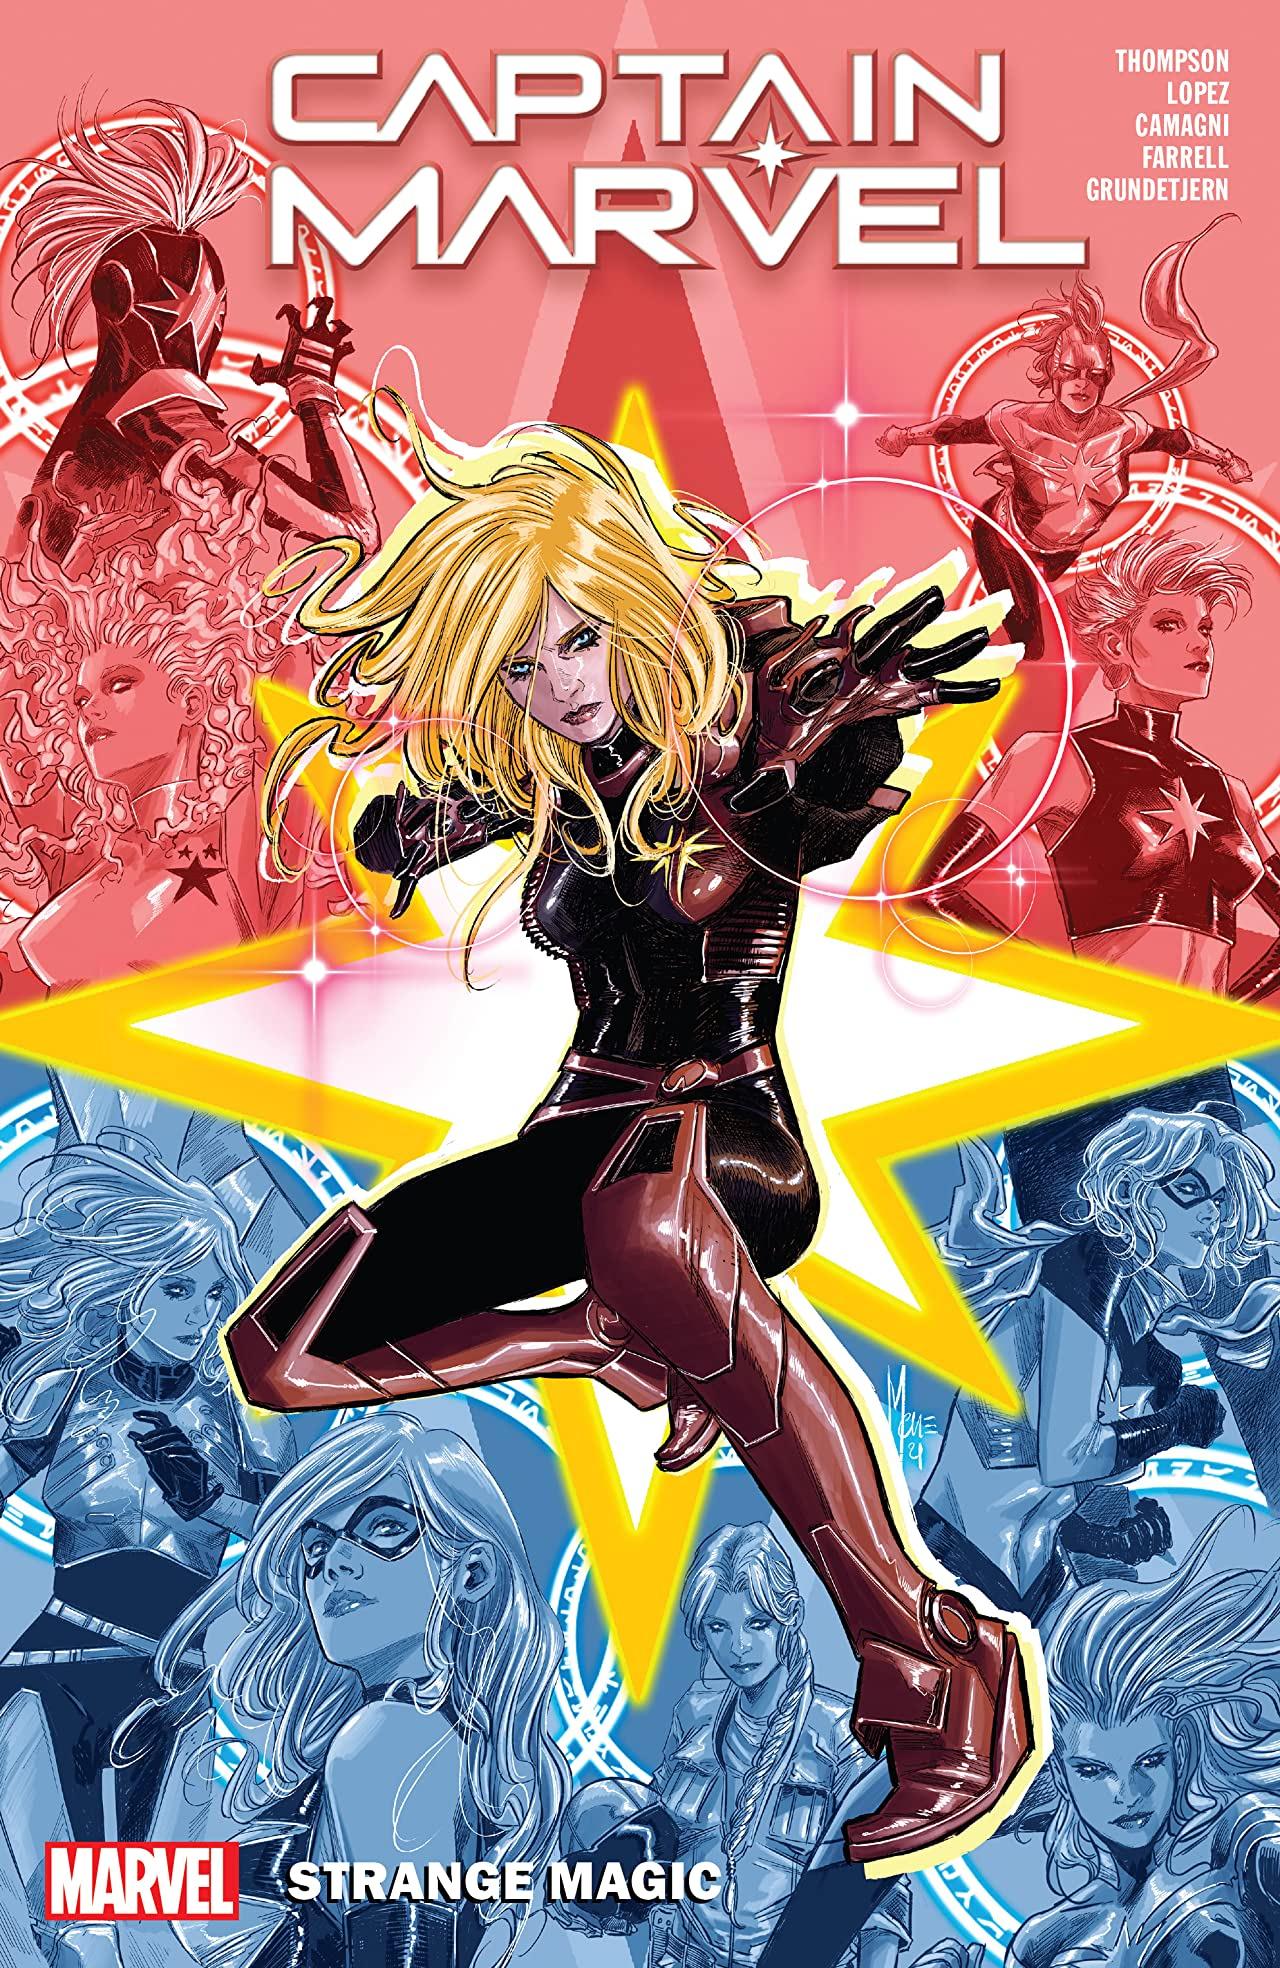 Captain Marvel Vol. 6: Strange Magic (Trade Paperback)